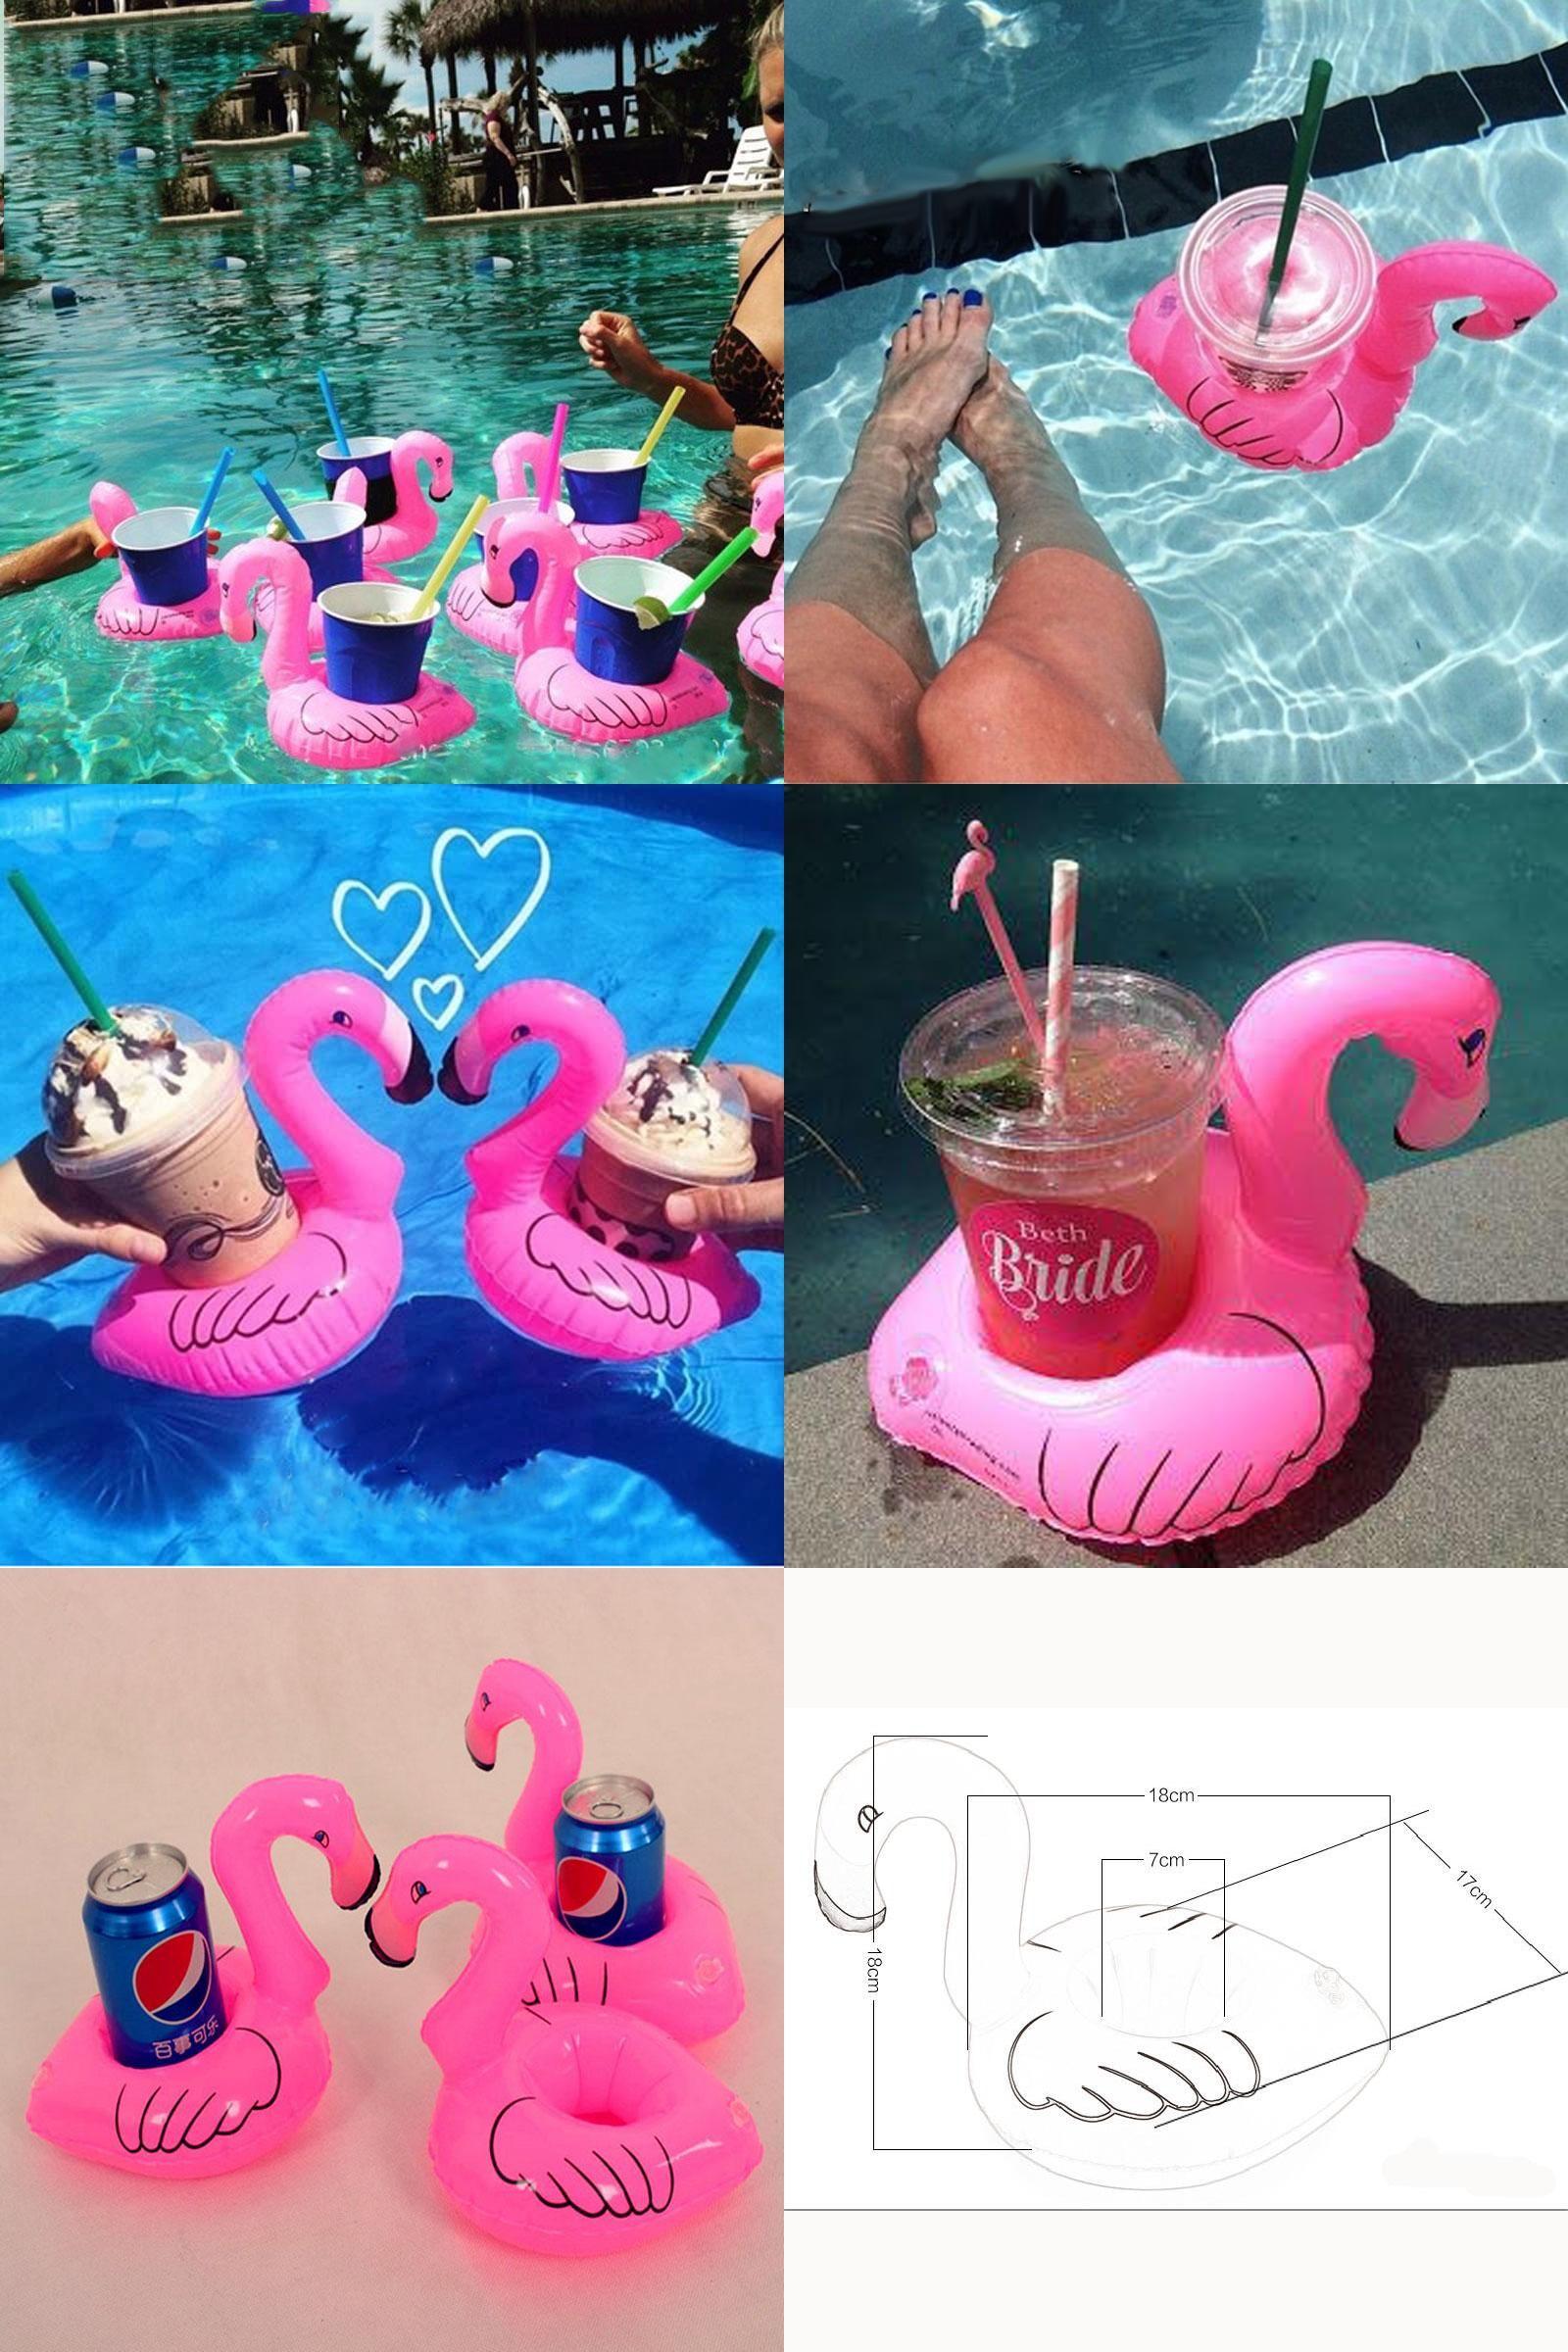 Visit to Buy] Mini Flamingo air mattresses Inflatable Water